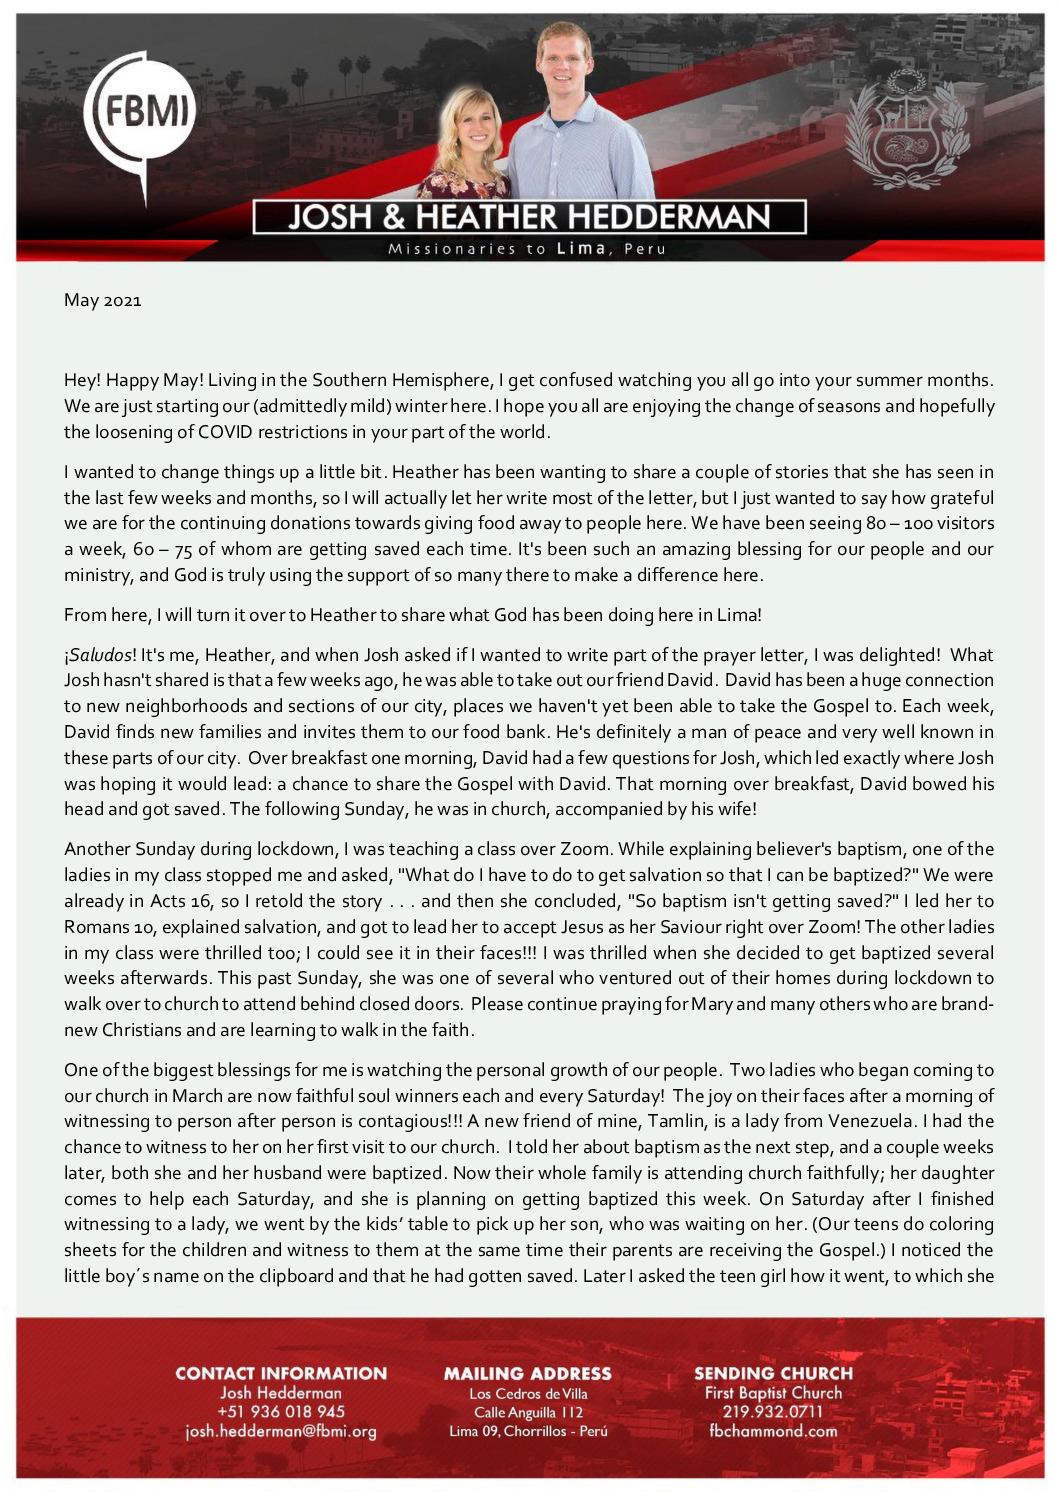 thumbnail of Josh Hedderman May 2021 Prayer Letter